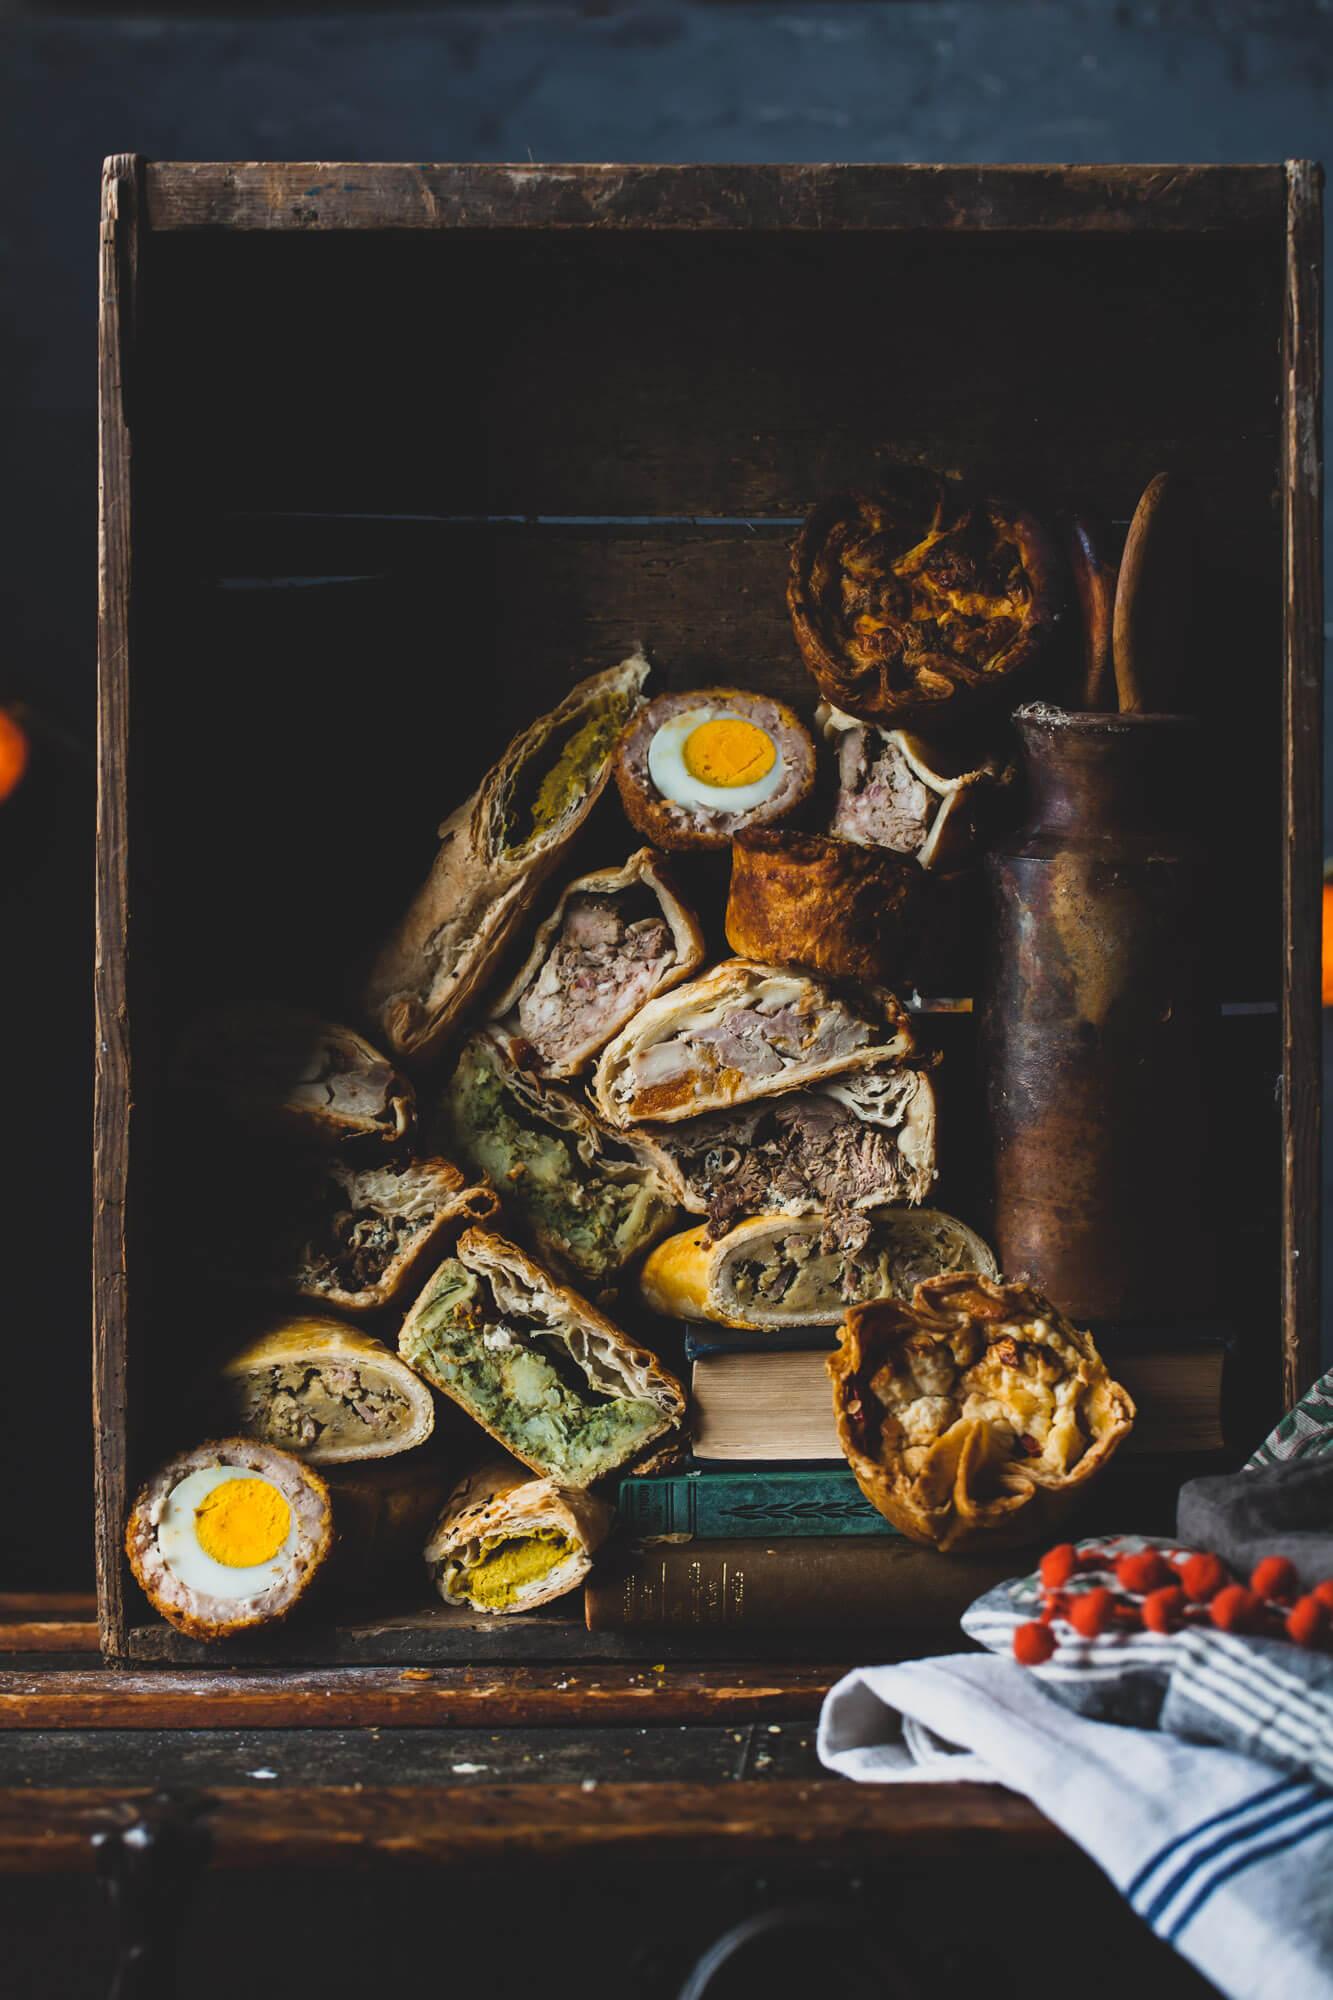 Pies -food photography-dorset- Lara Jane Thorpe